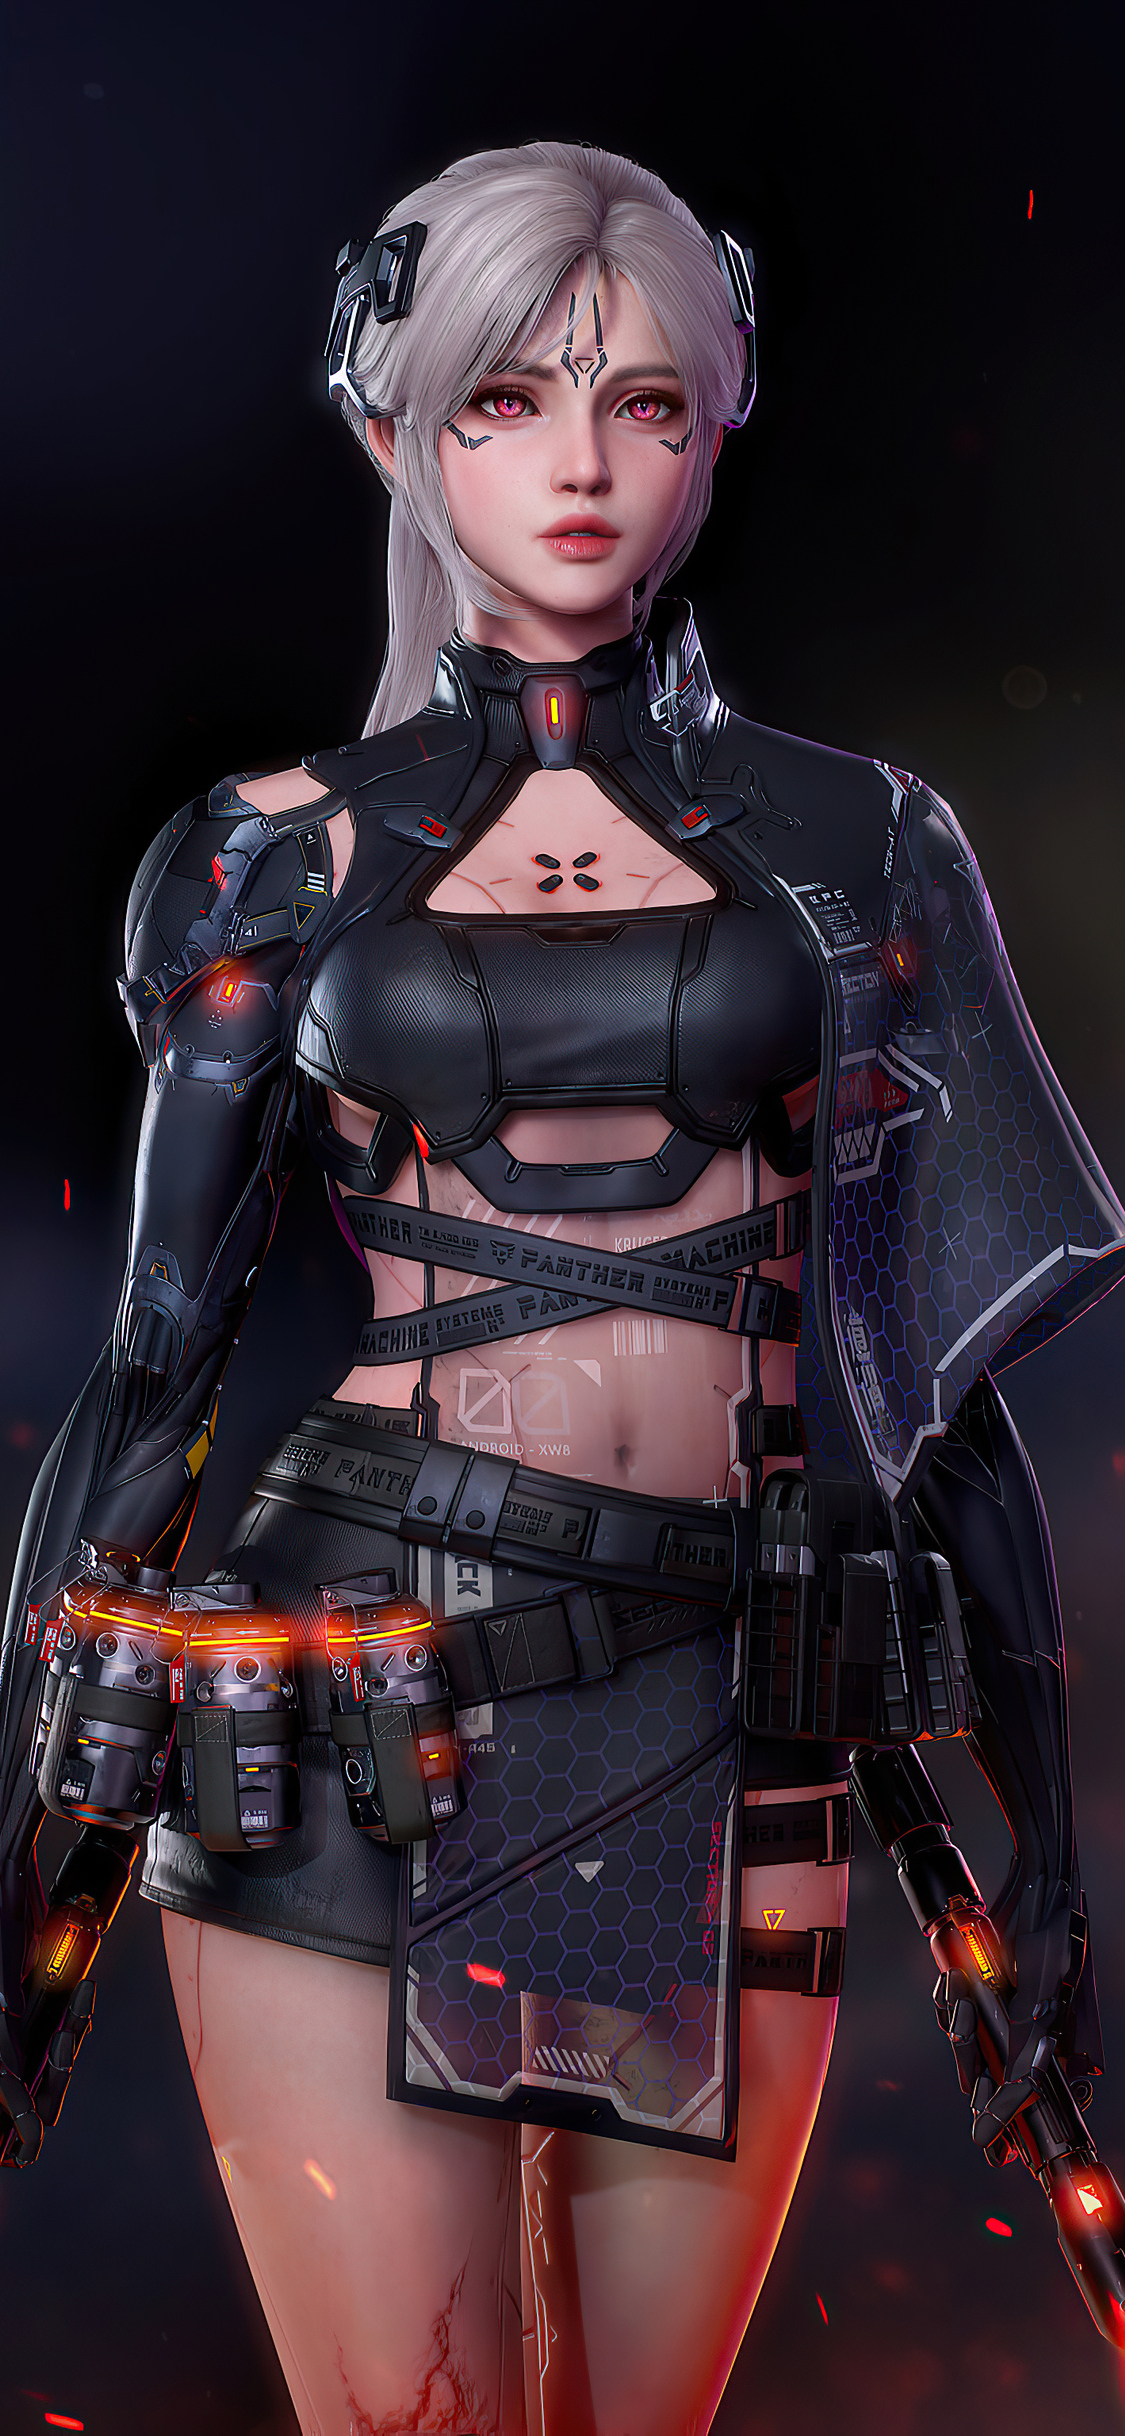 1125x2436 Cyberpunk Girl Arm 4k Iphone XS,Iphone 10,Iphone ...